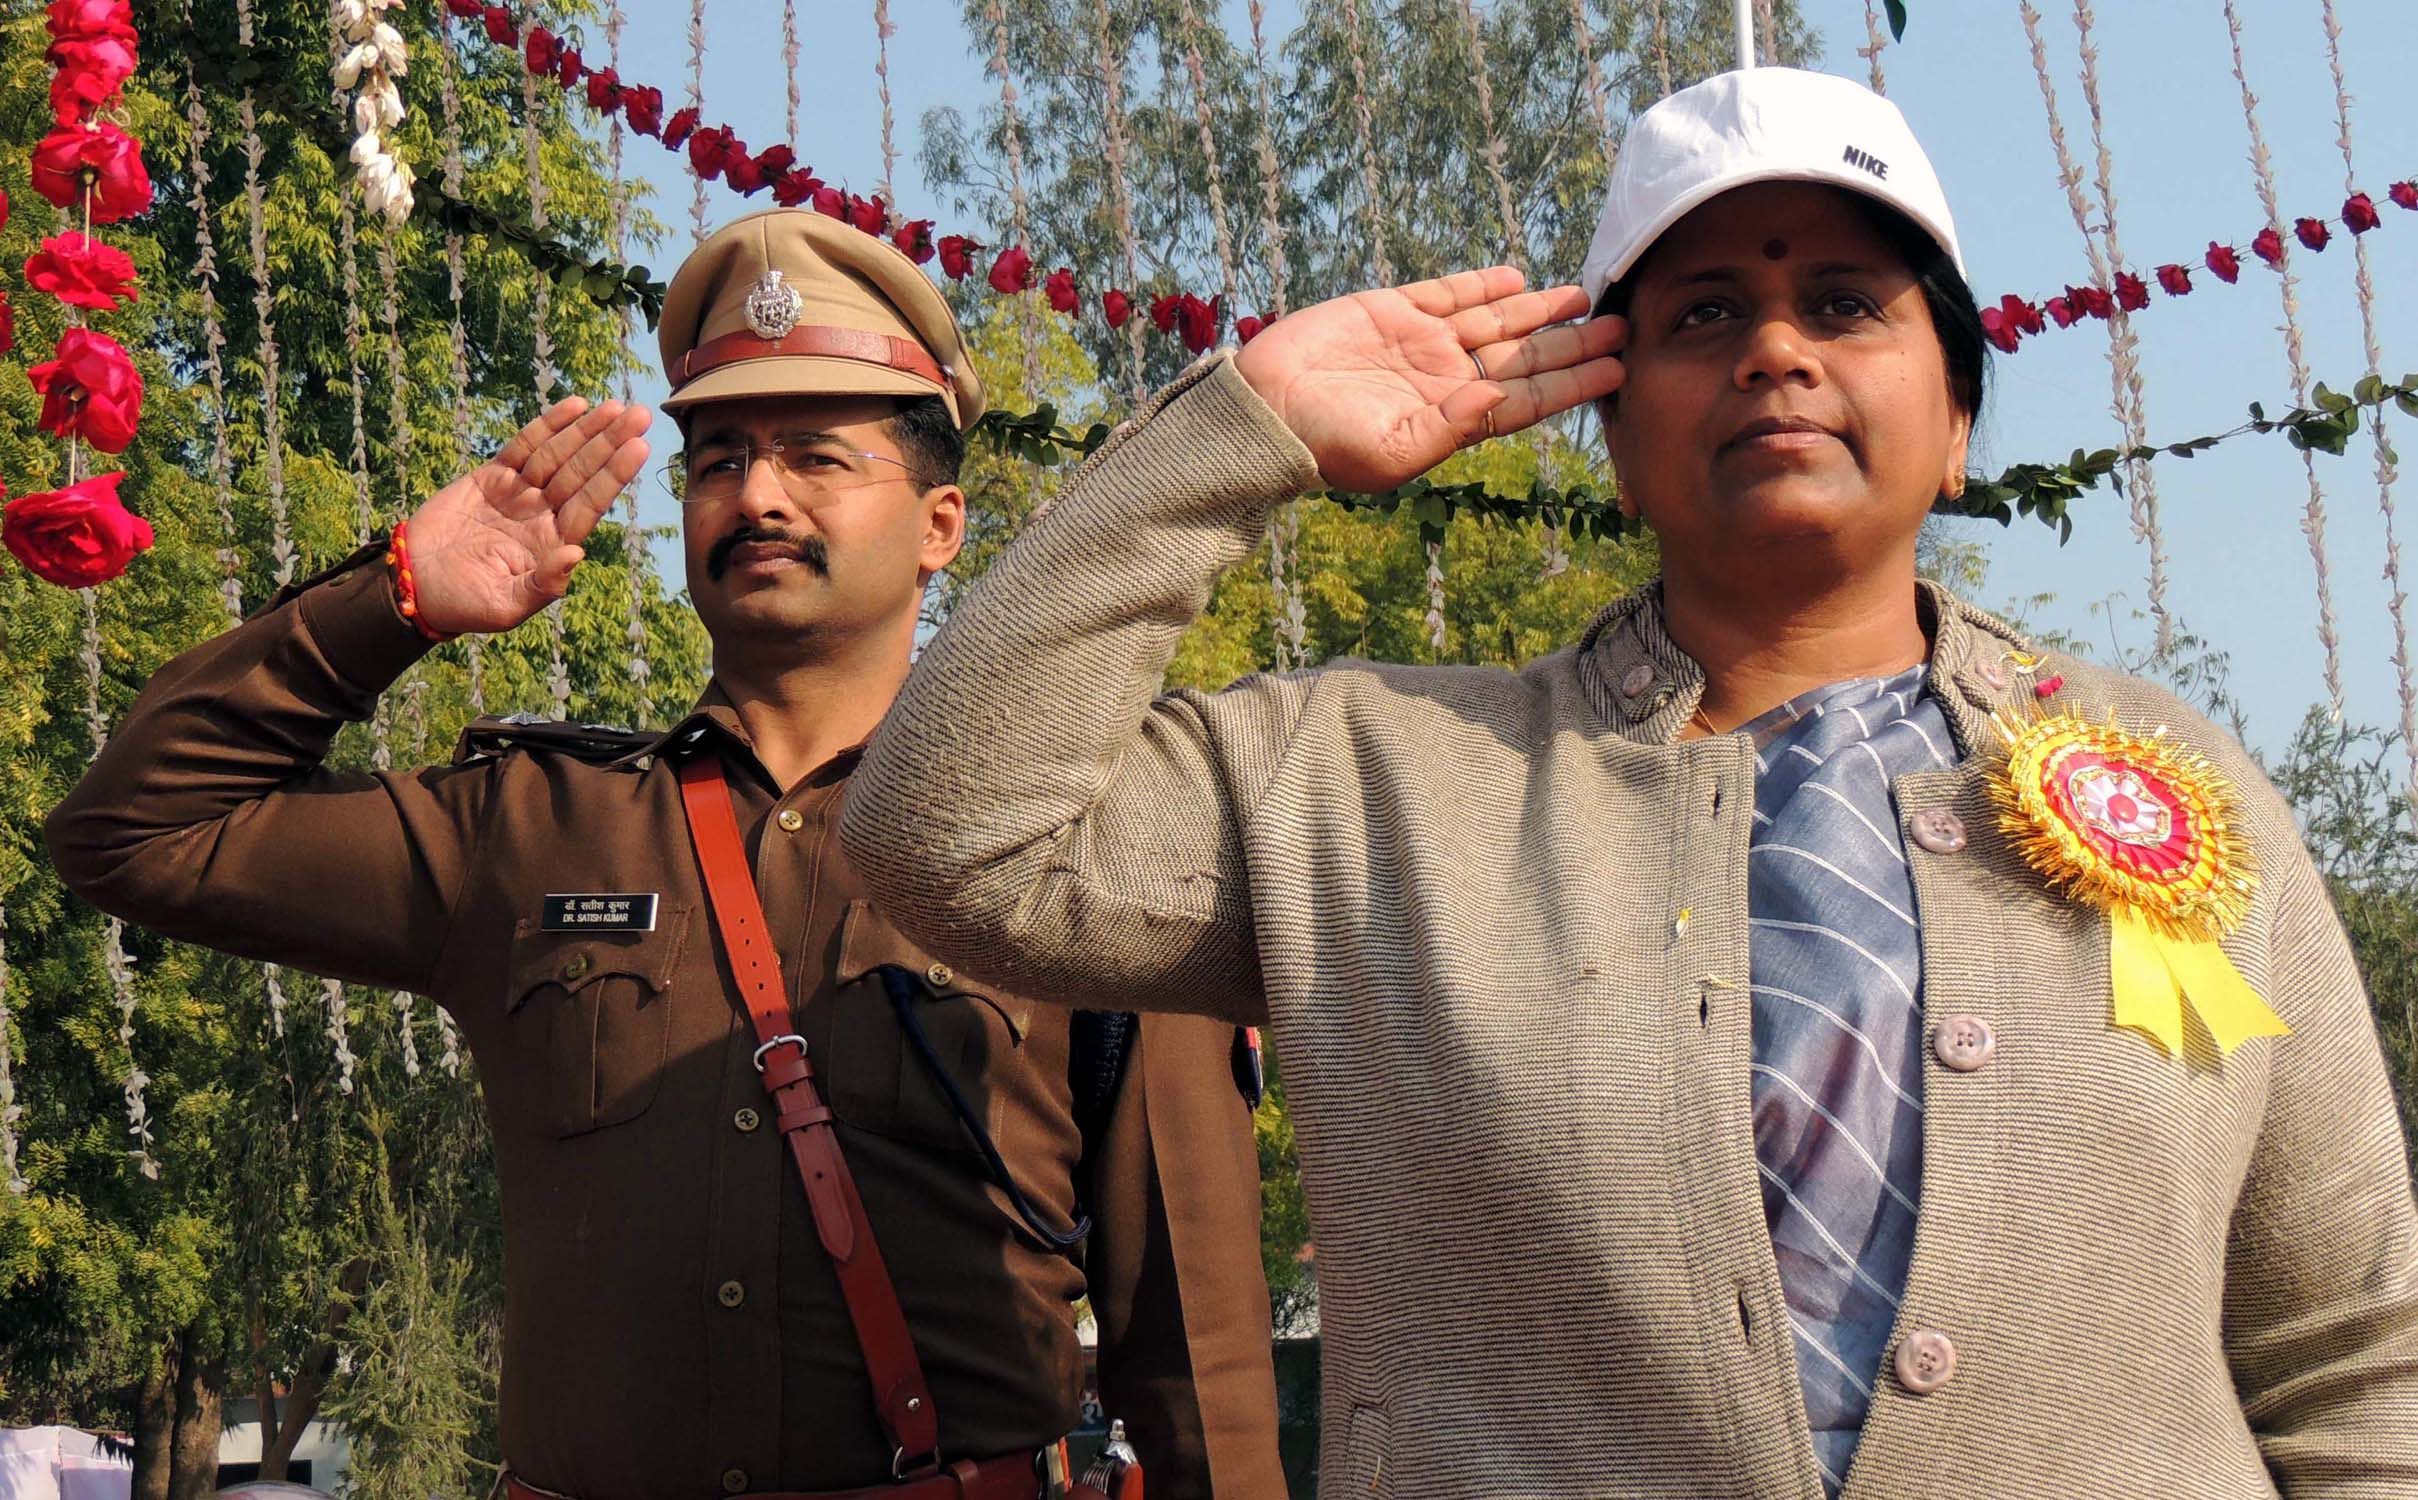 पुलिस लाइन मे गणतंत्र दिवस पर परेड की सलामी लेती प्रभारी मंत्री नीलिमा कटियार व एसपी सतीश कुमार